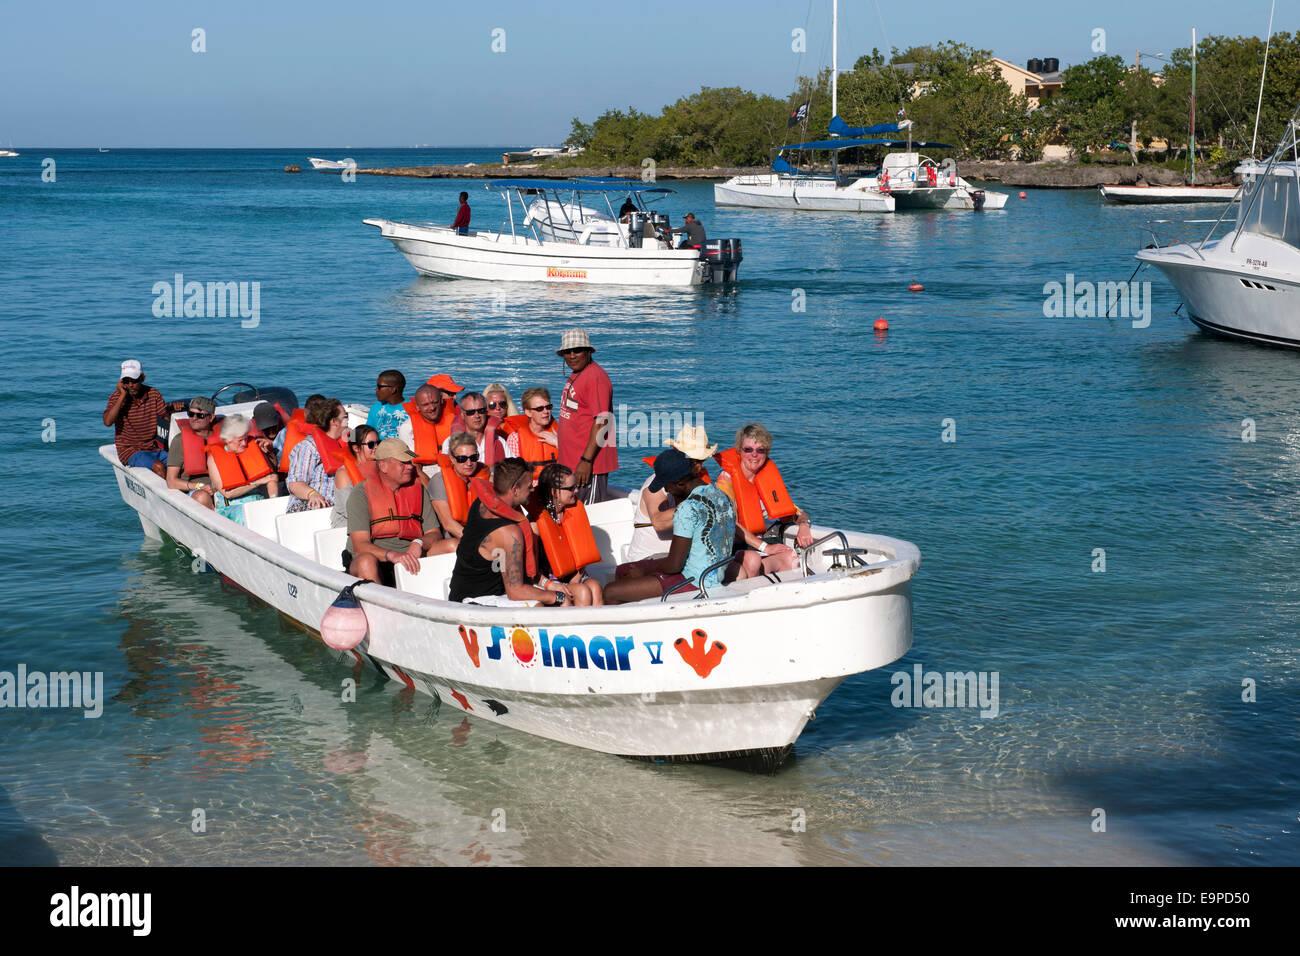 Dominikanische Republik, Osten, Bayahibe, Boot zur Insel Saona - Stock Image